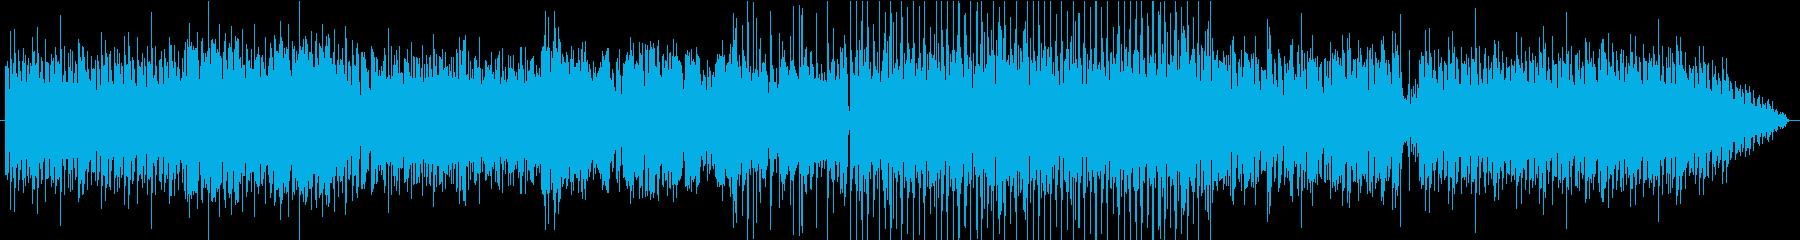 EDMのBGMの再生済みの波形